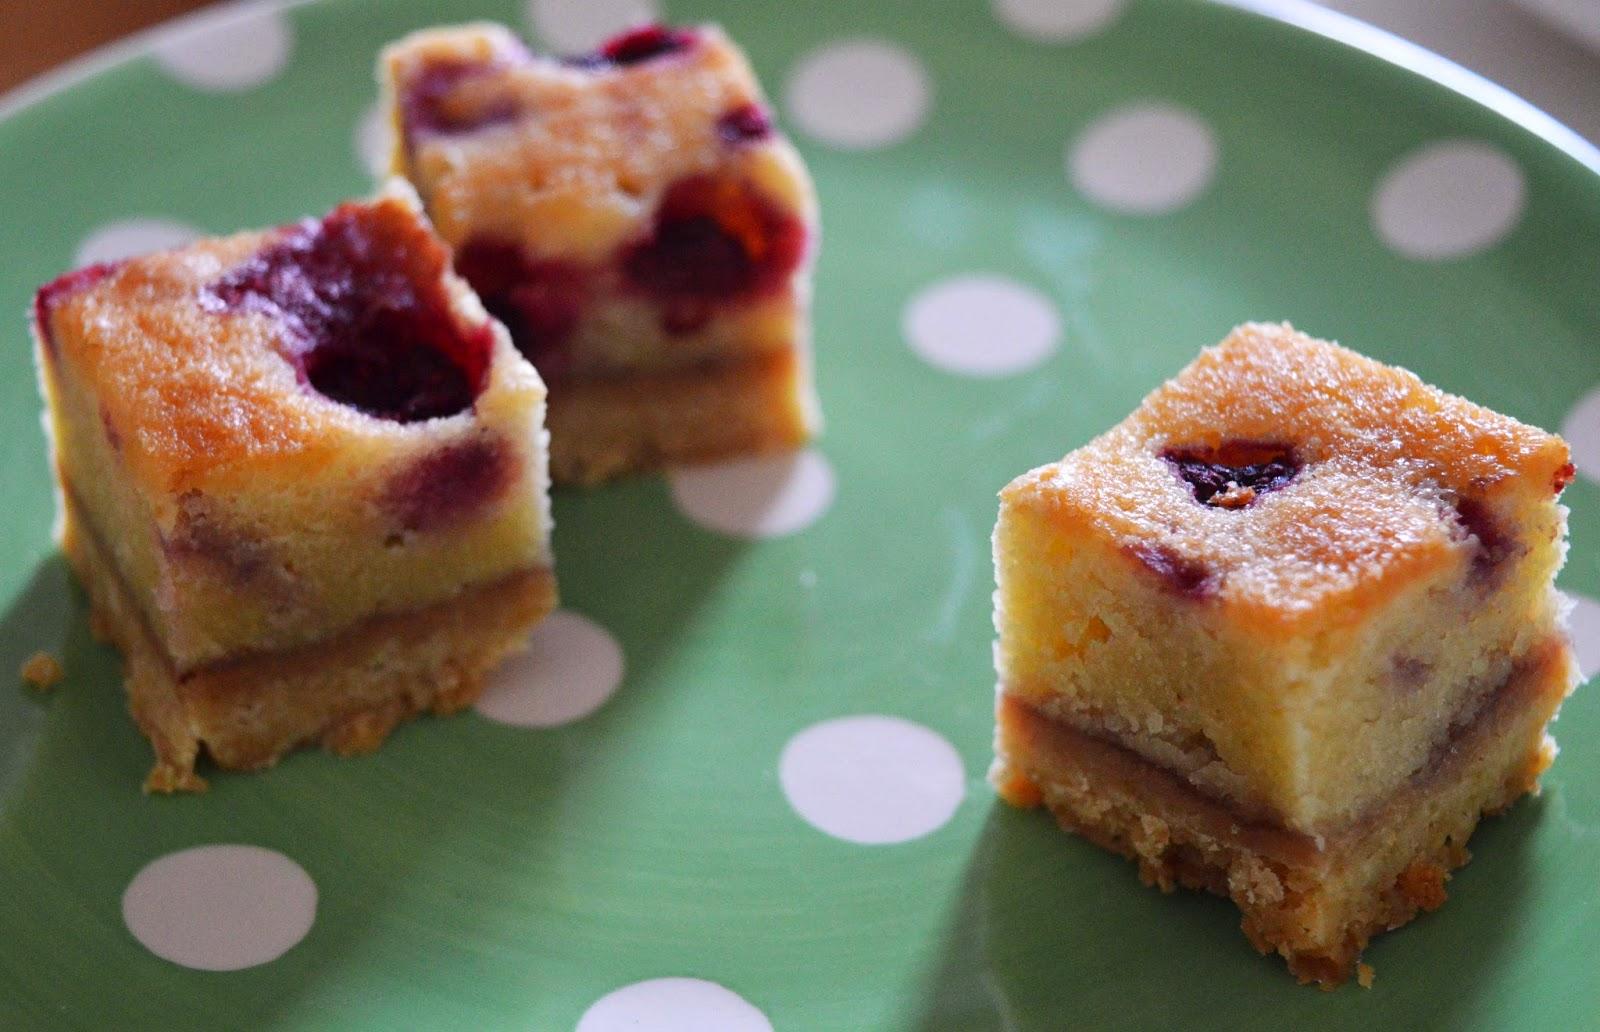 Tarte & Berry Interview Audacity of Food